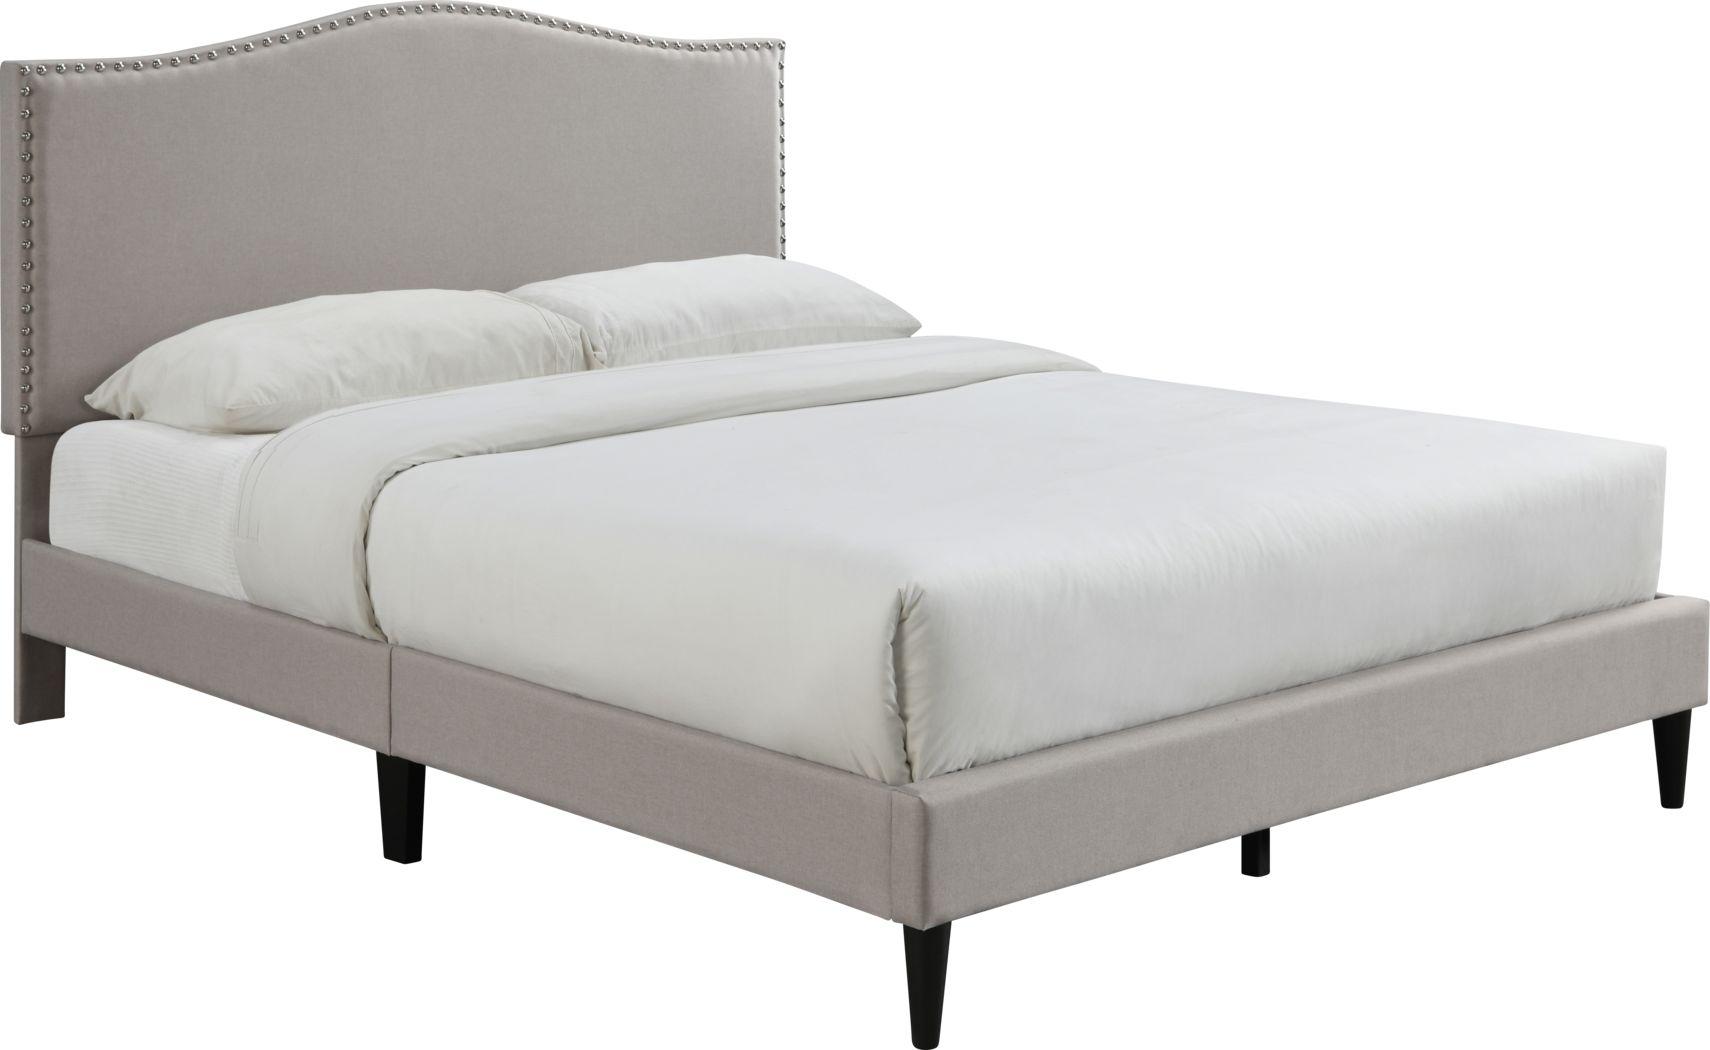 Trapon Beige Queen Bed